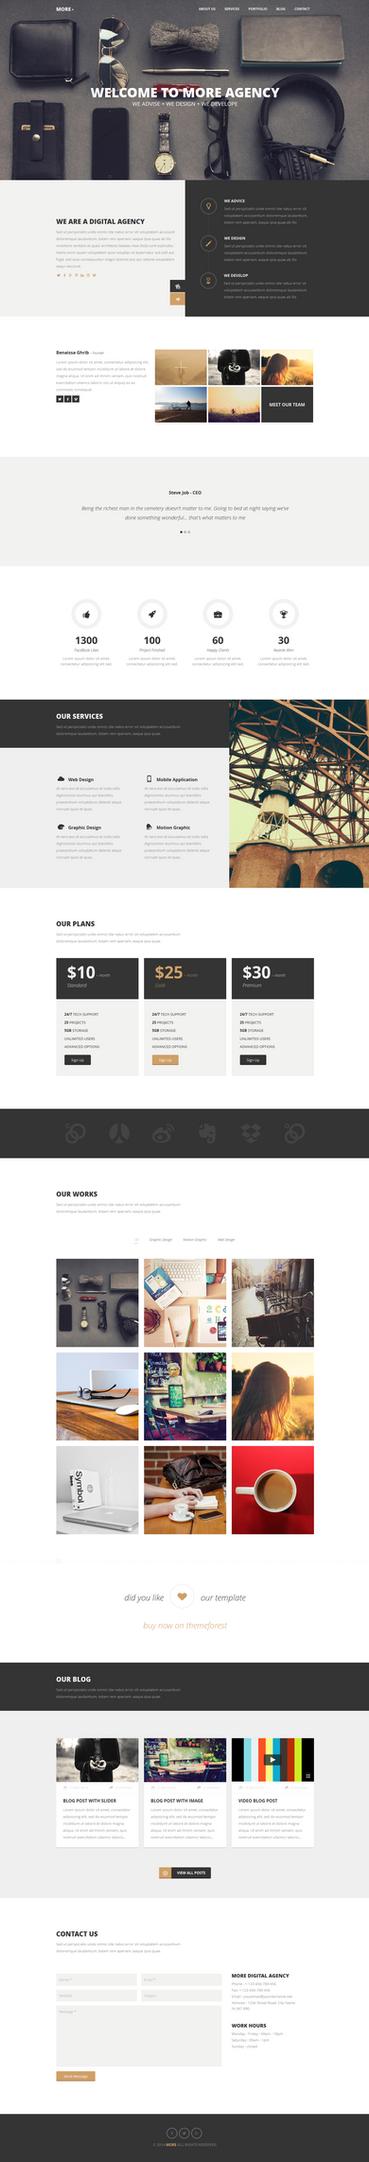 MORE - Creative One Page WordPress Theme by webdesigngeek